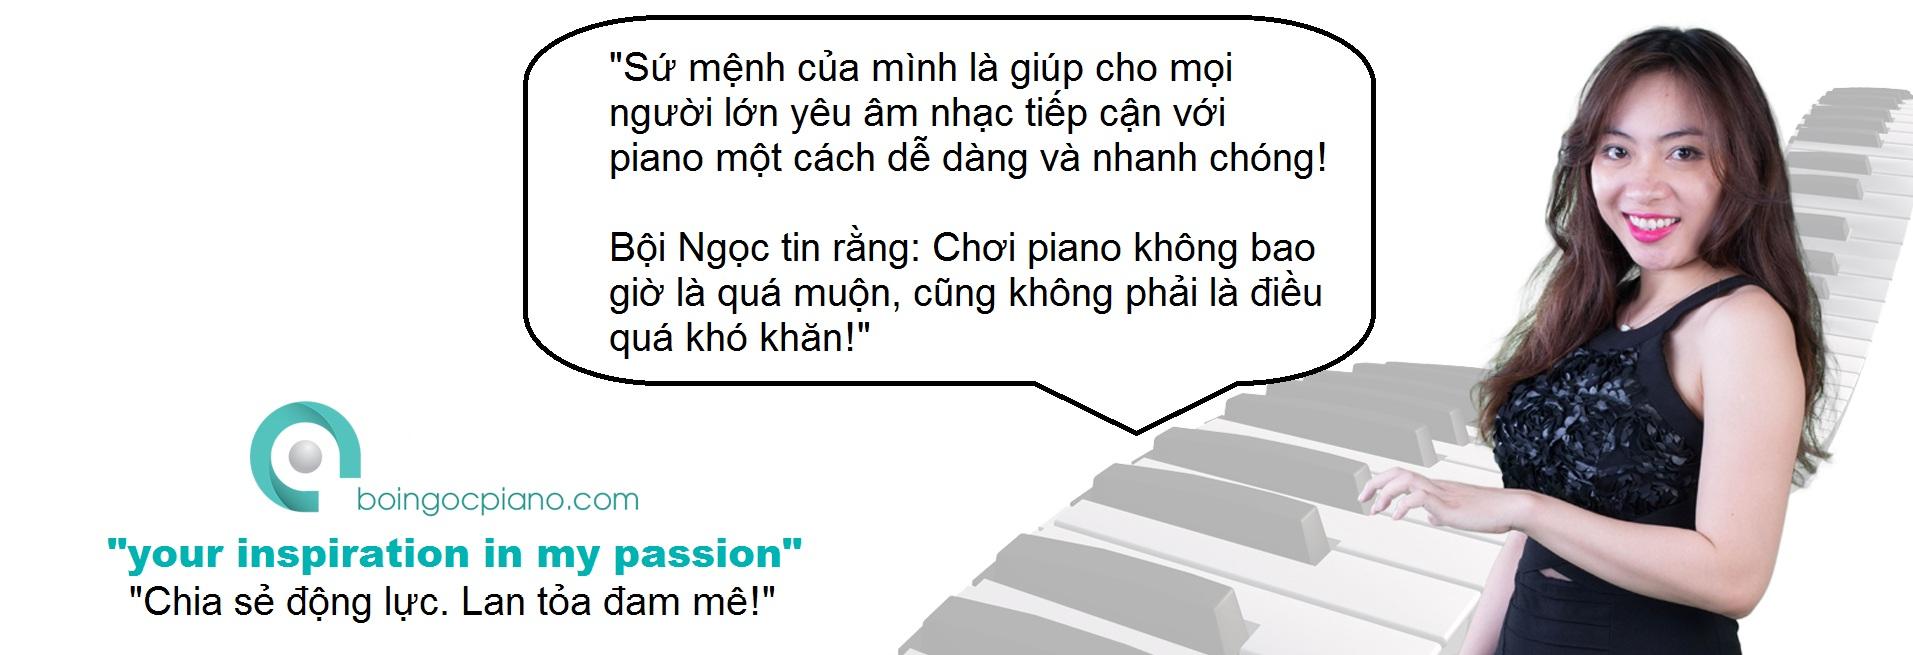 boi ngoc piano